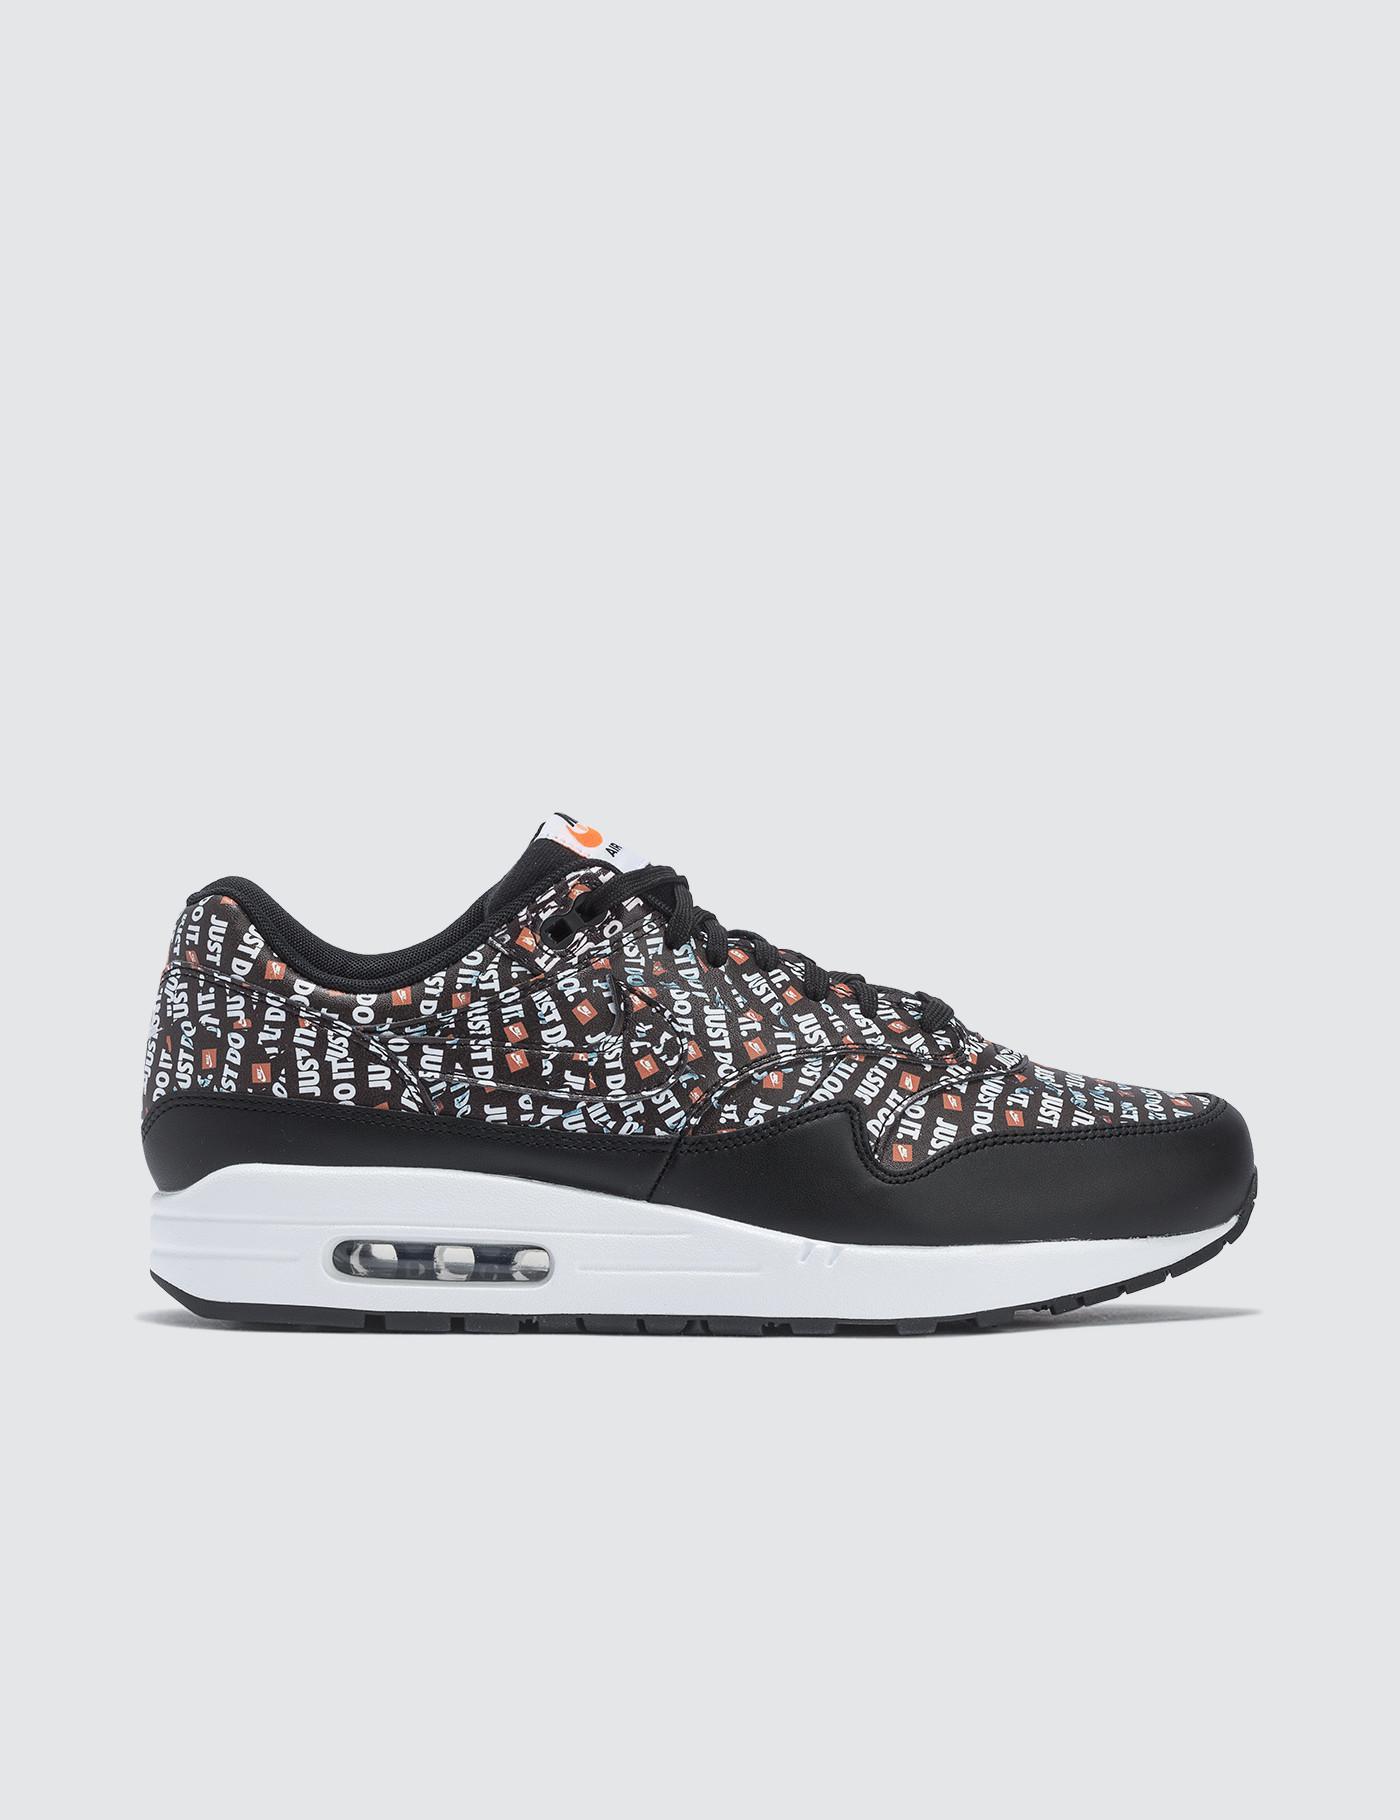 Lyst - Nike Air Max 1 Premium in Black for Men c357910ef